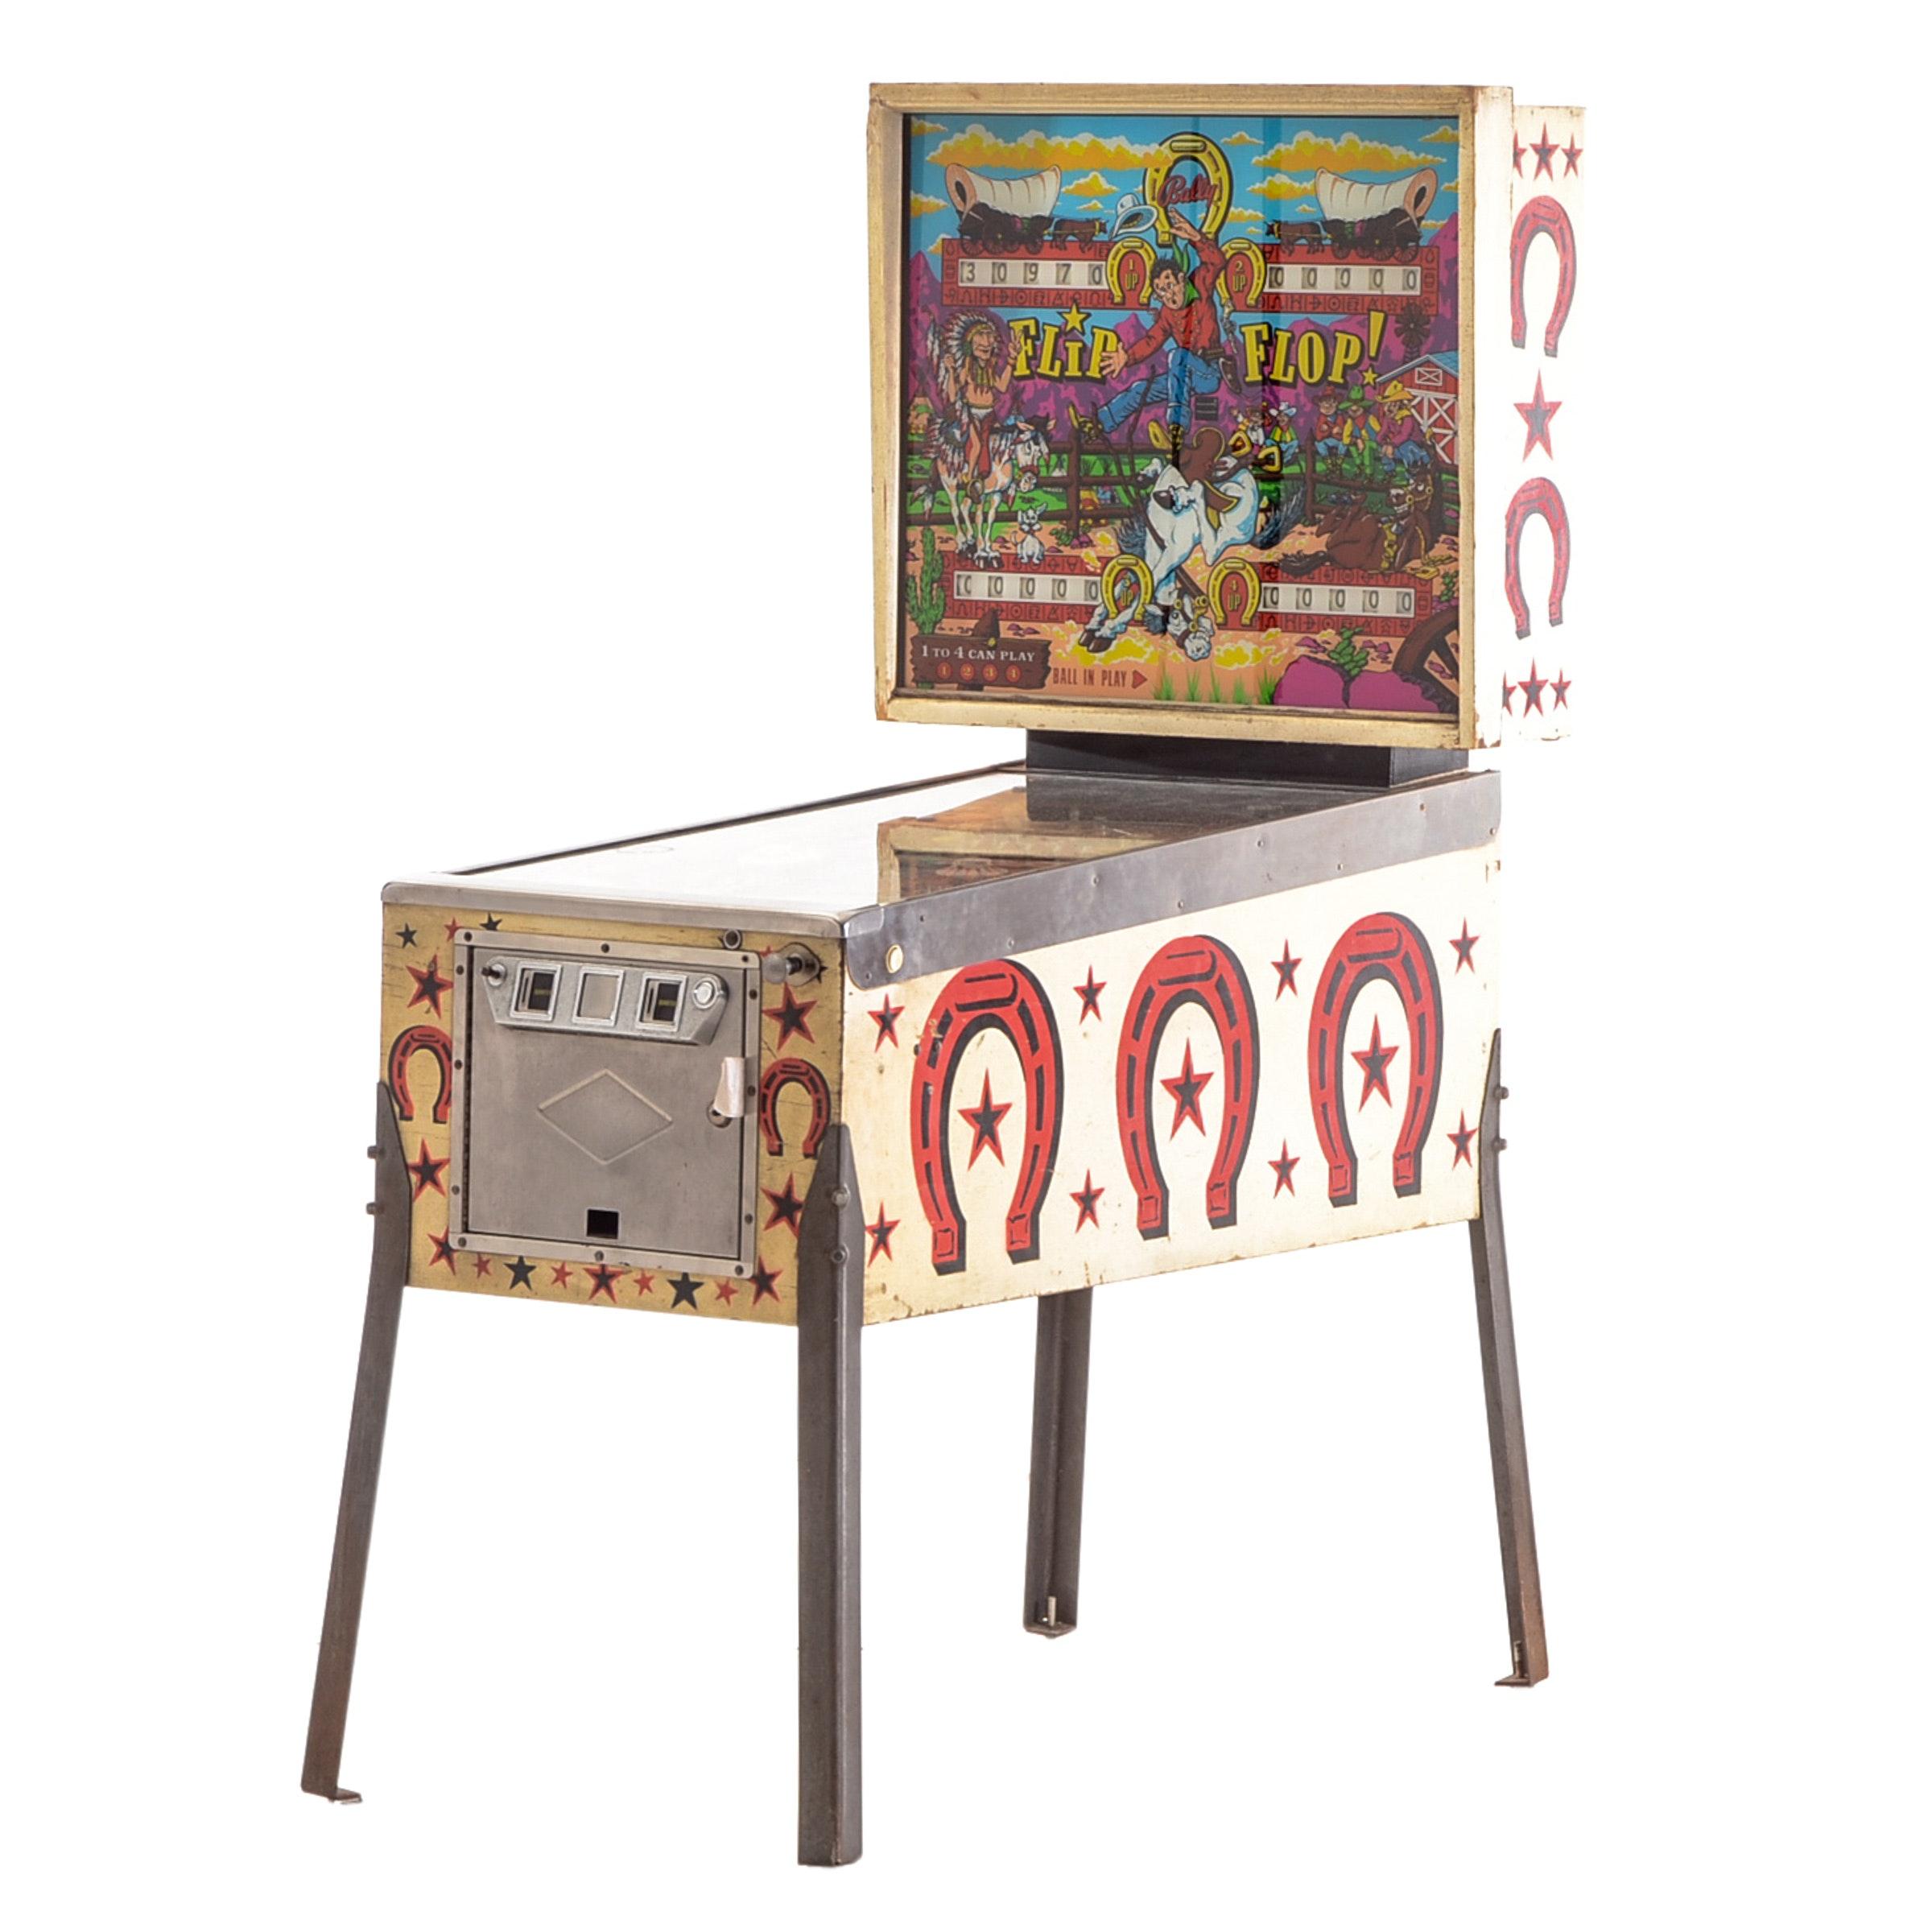 """Flip Flop!"" Pinball Machine by Bally"